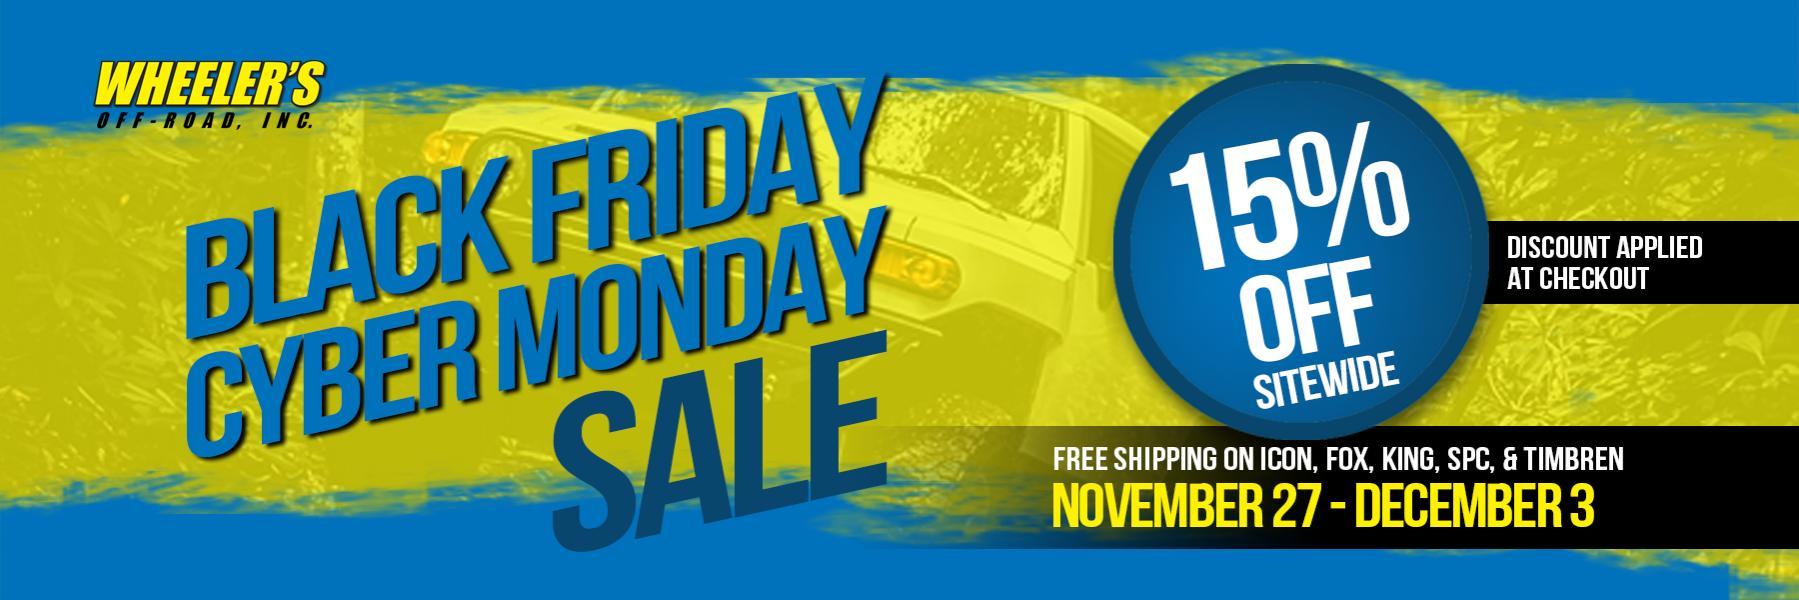 Black Friday Sales!!-wor-black-friday-website-banner-jpg